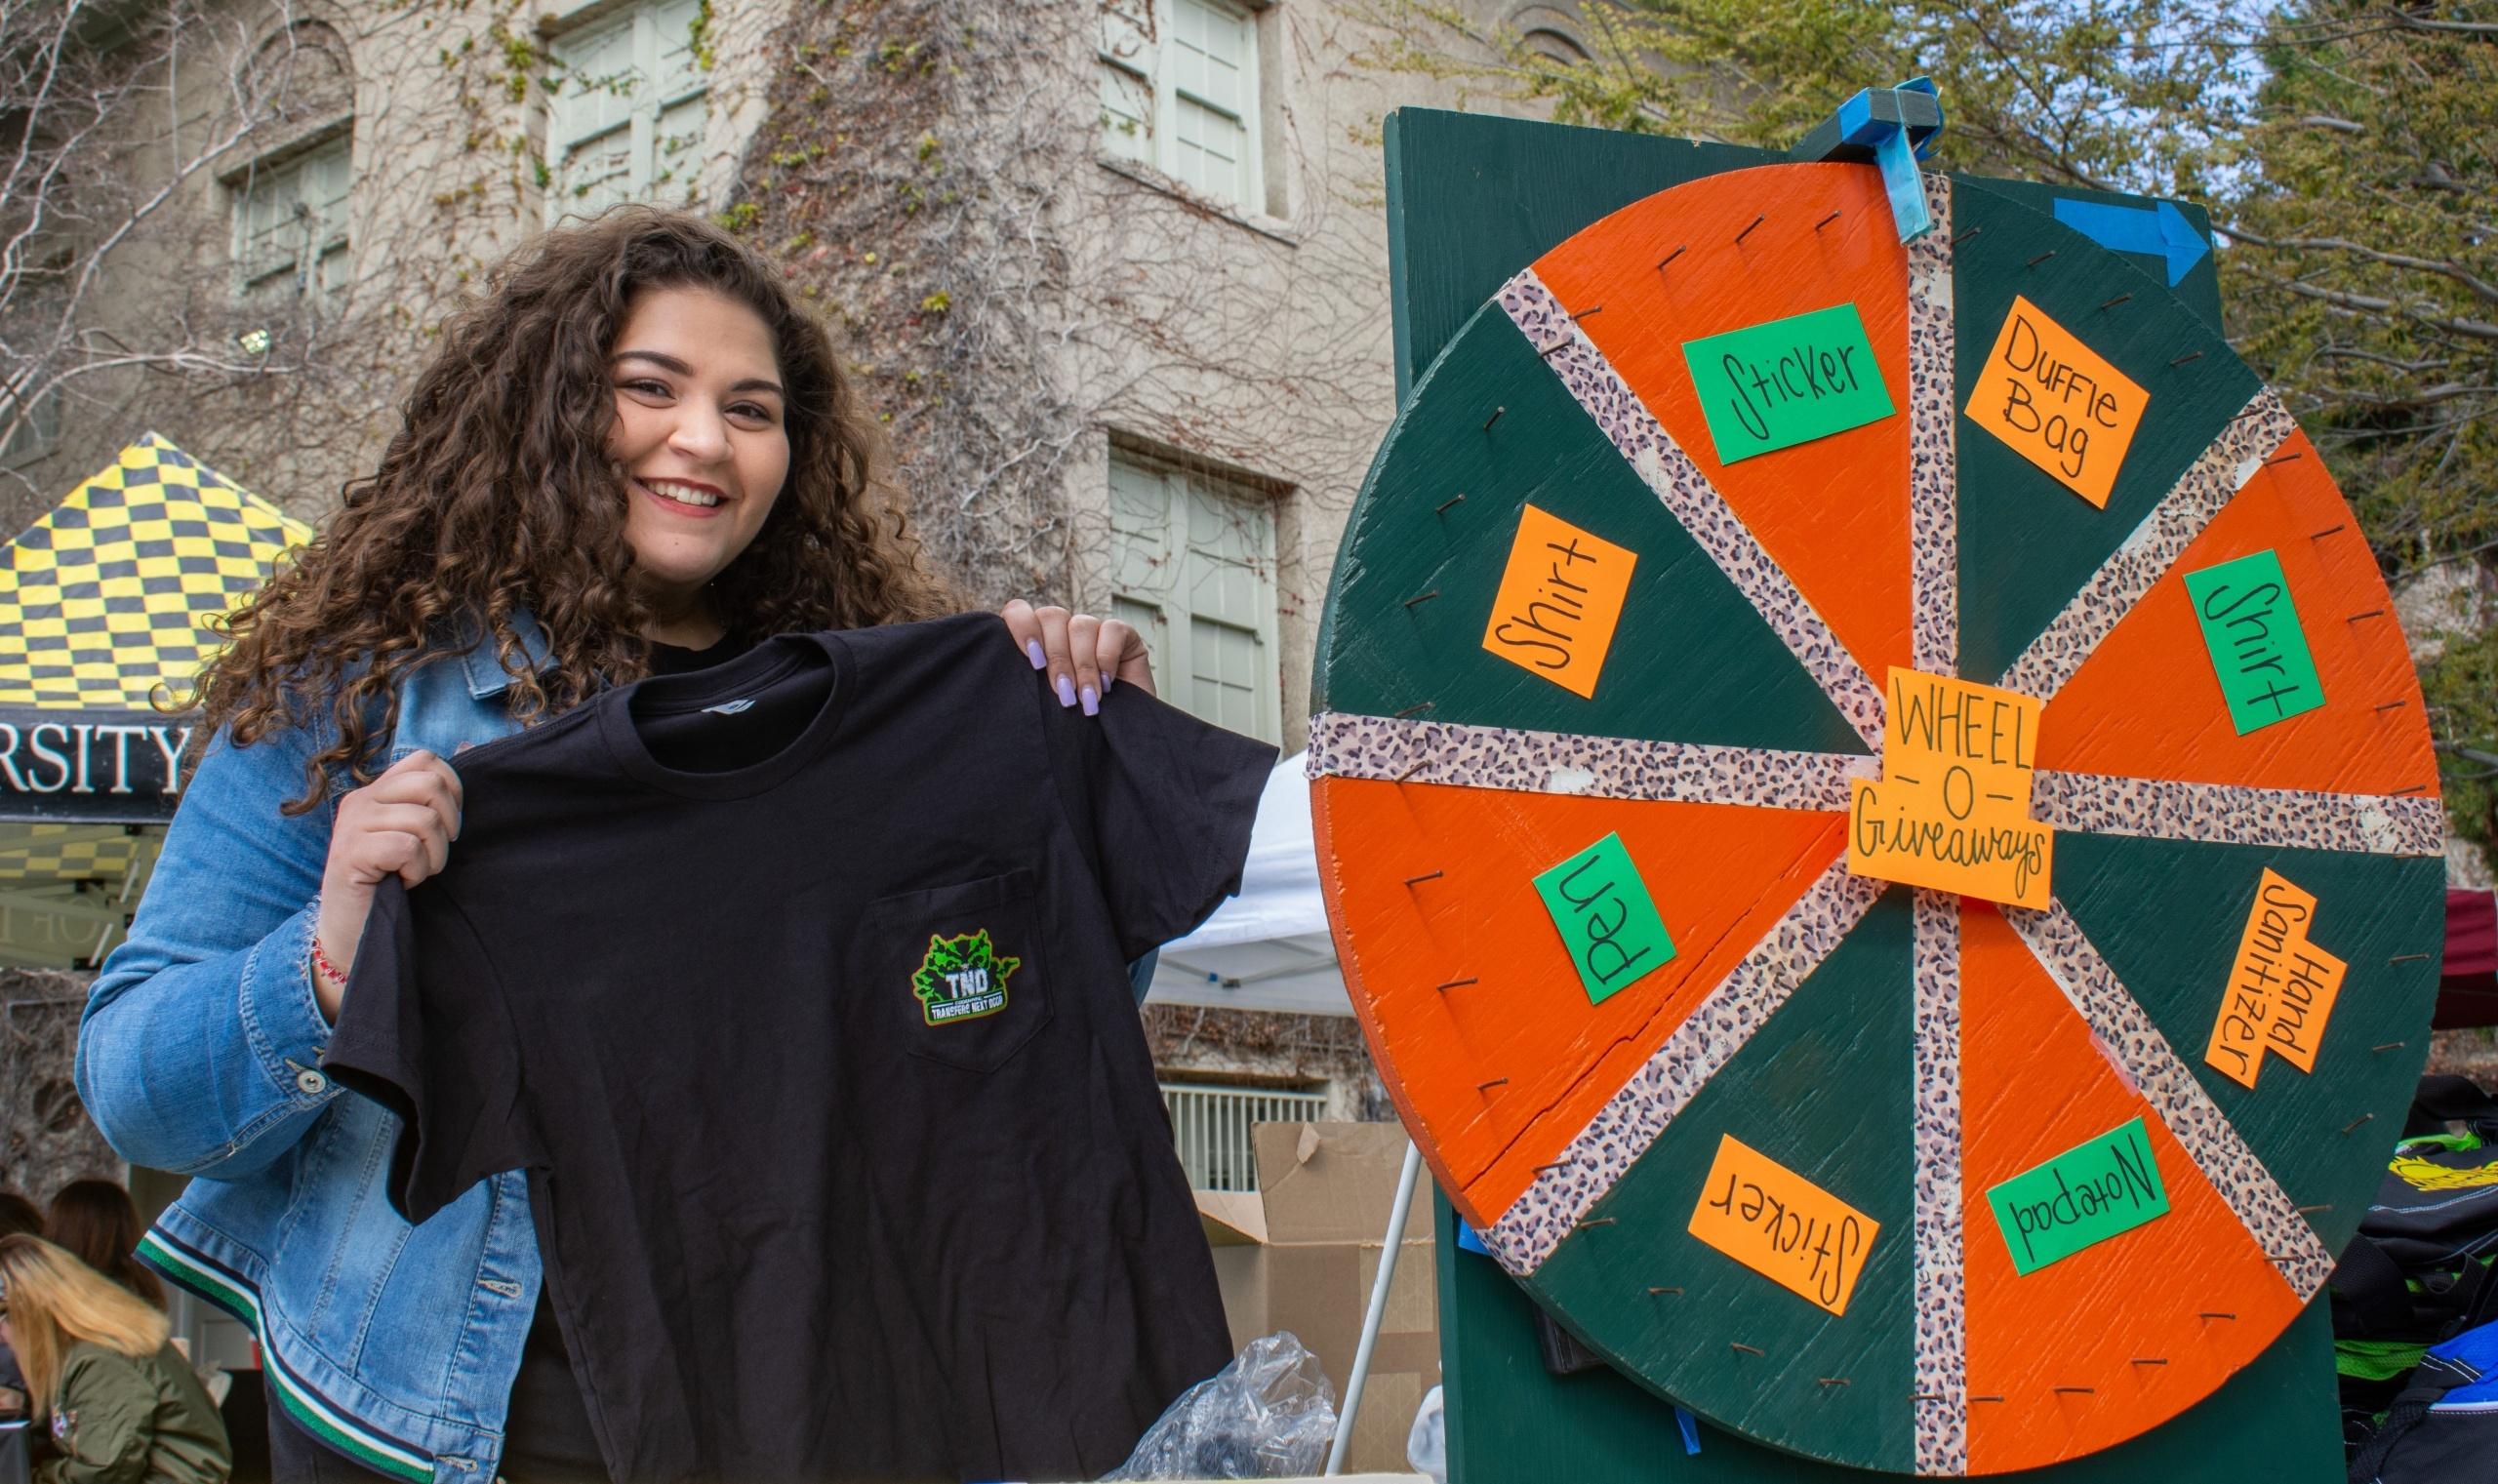 Transfer student holding a University of La Verne t-shirt